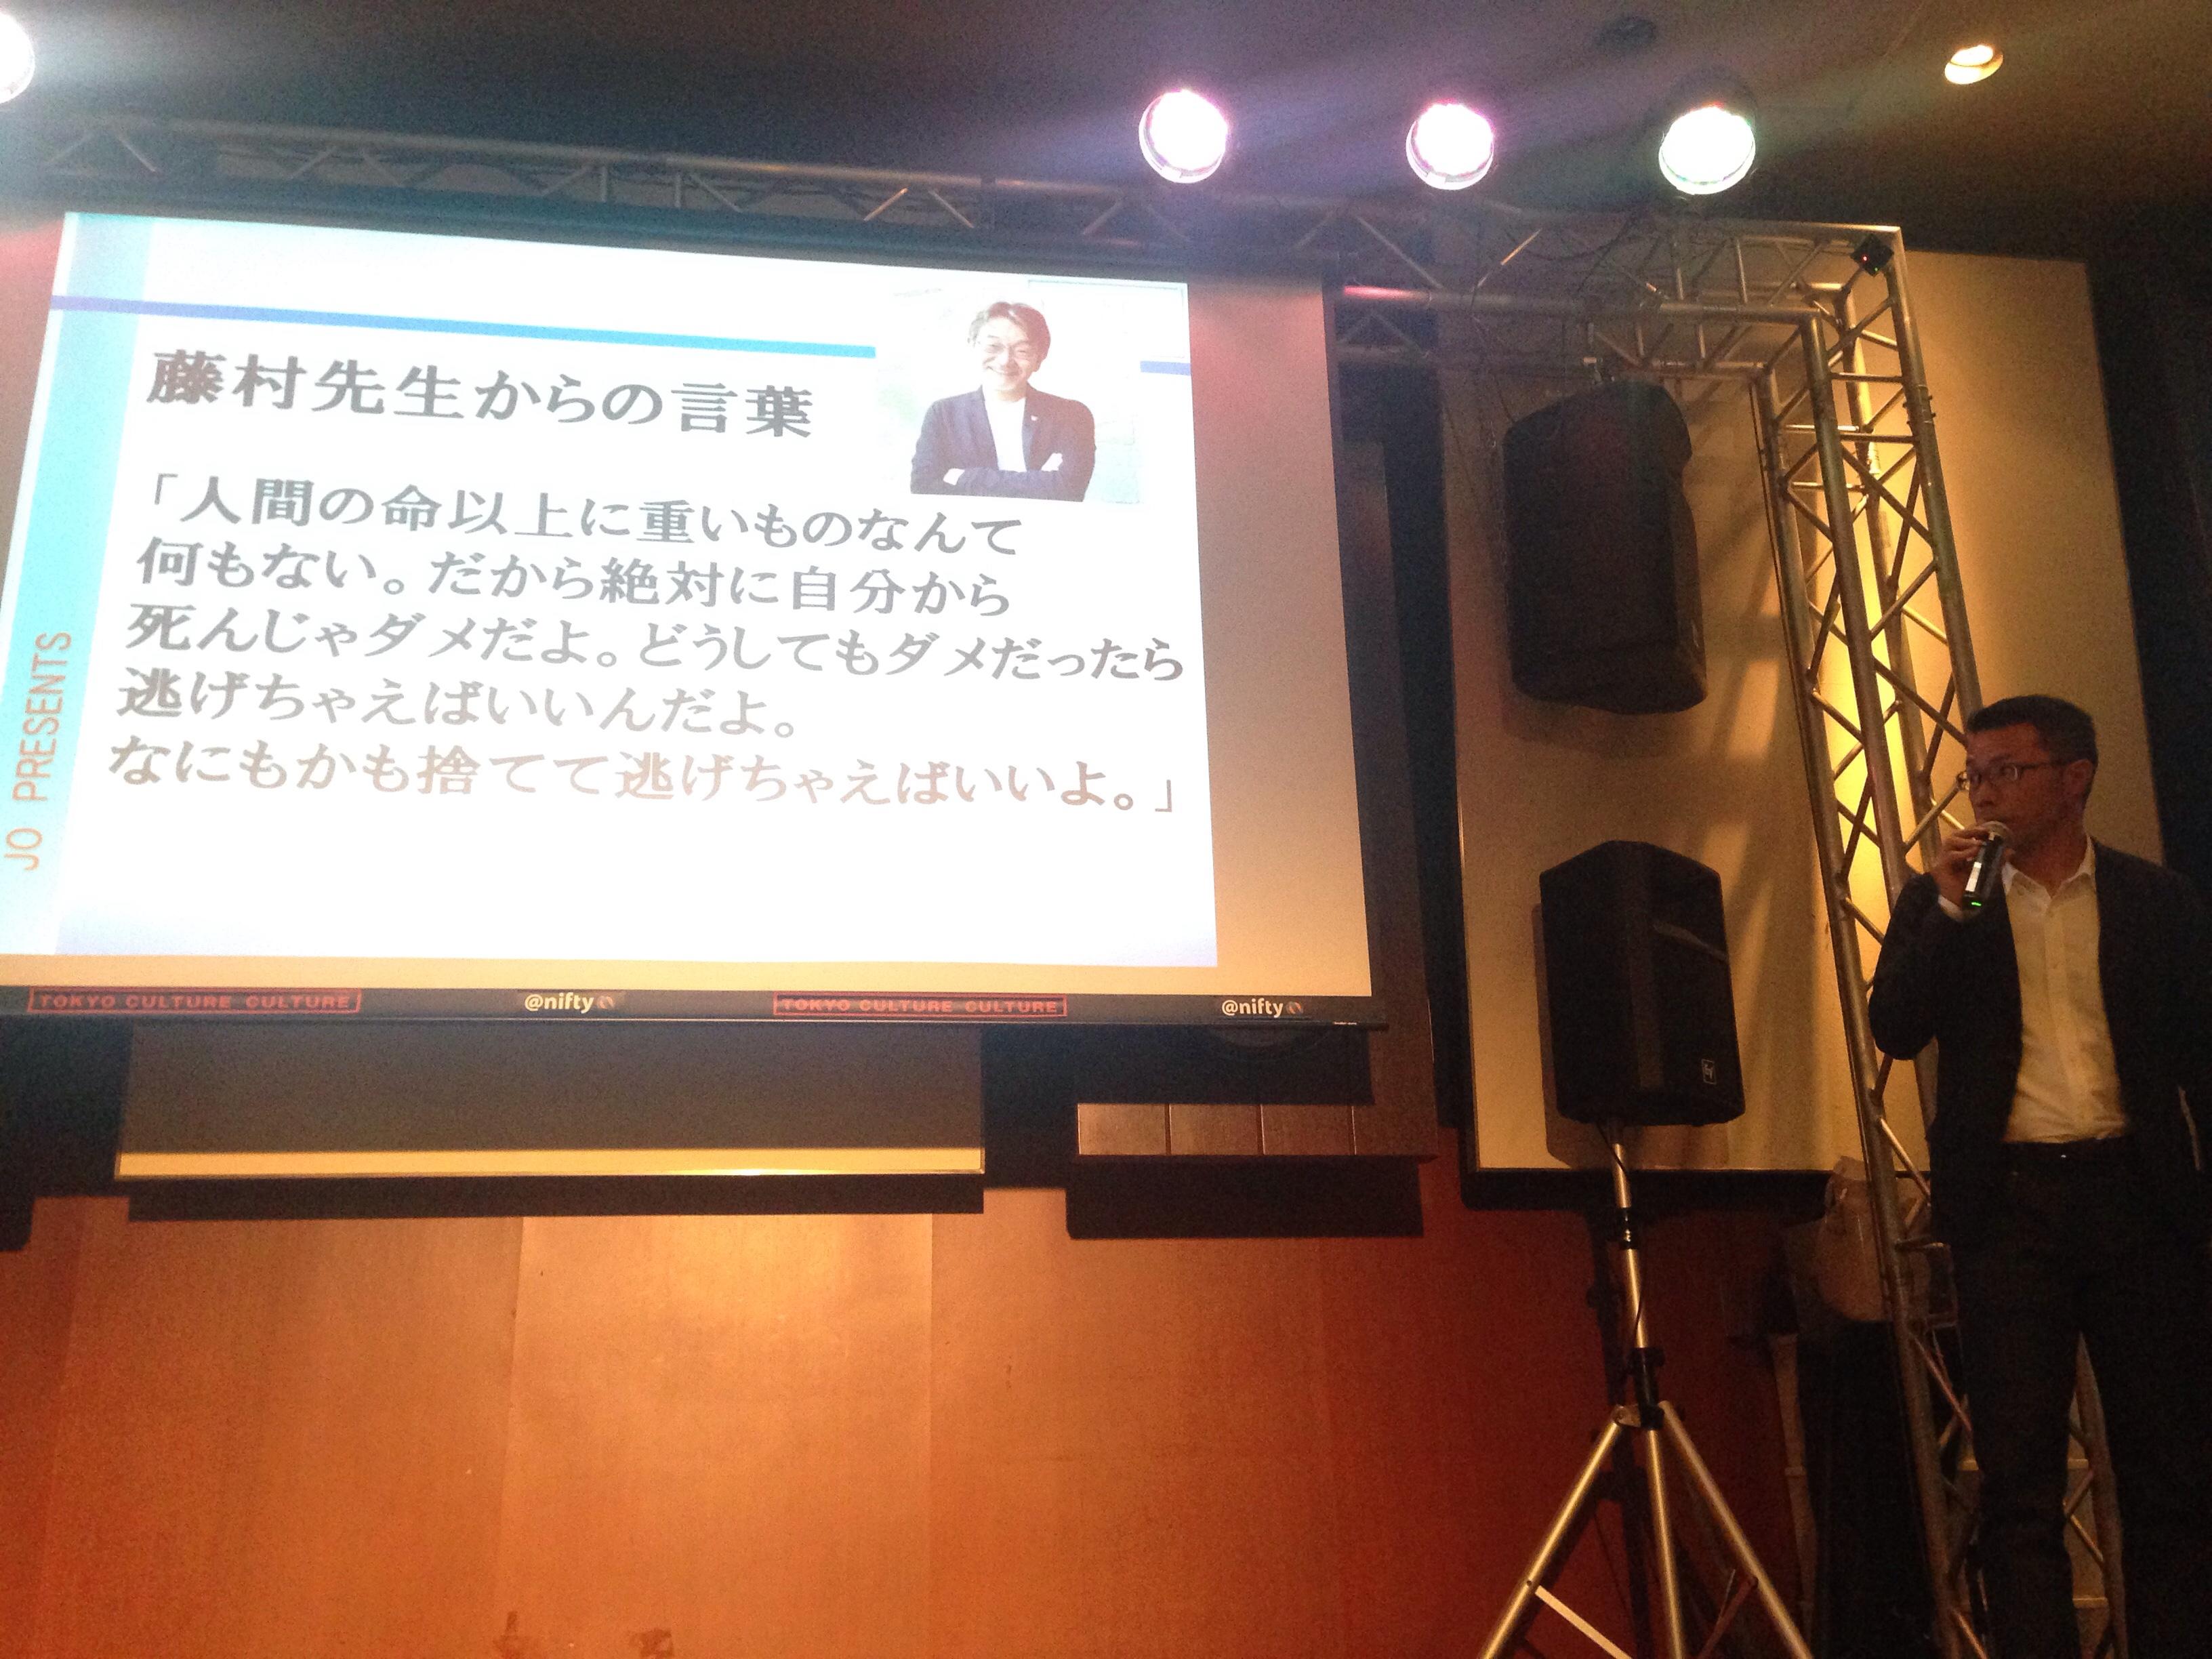 fc2blog_20161106180014086.jpg